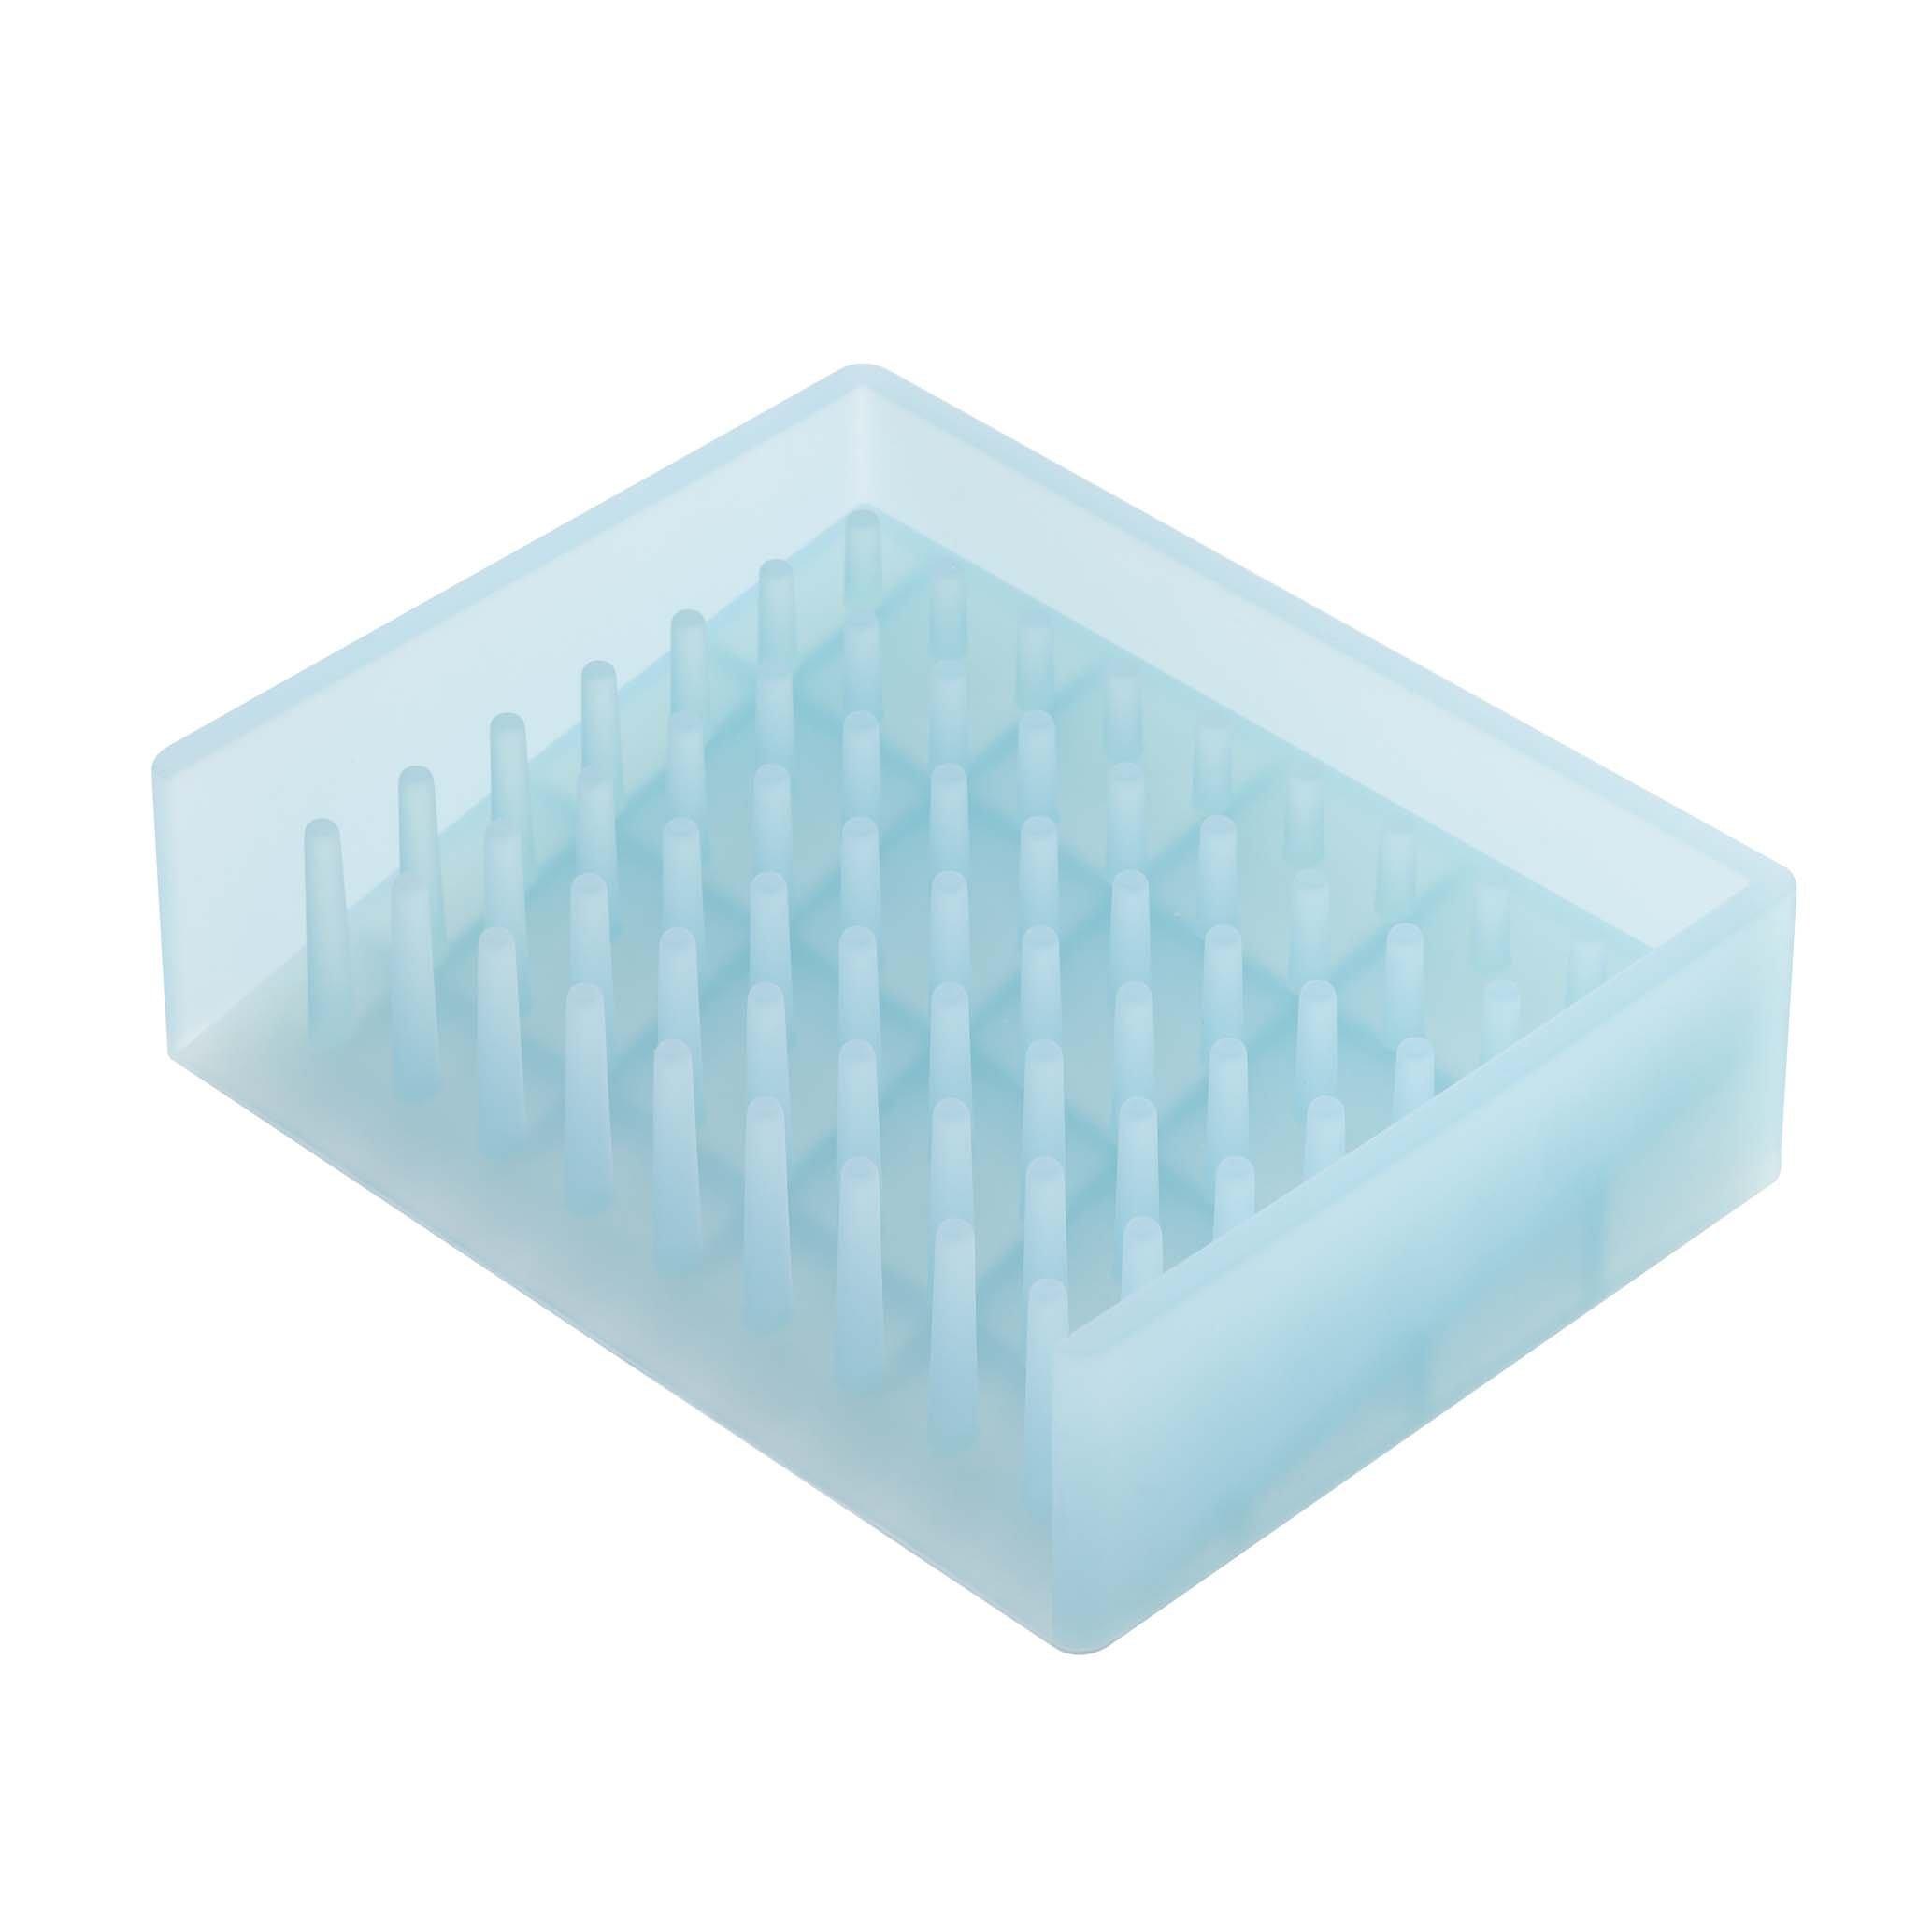 YAMAZAKI home 2994 Float Self Draining Soap Tray, Blue